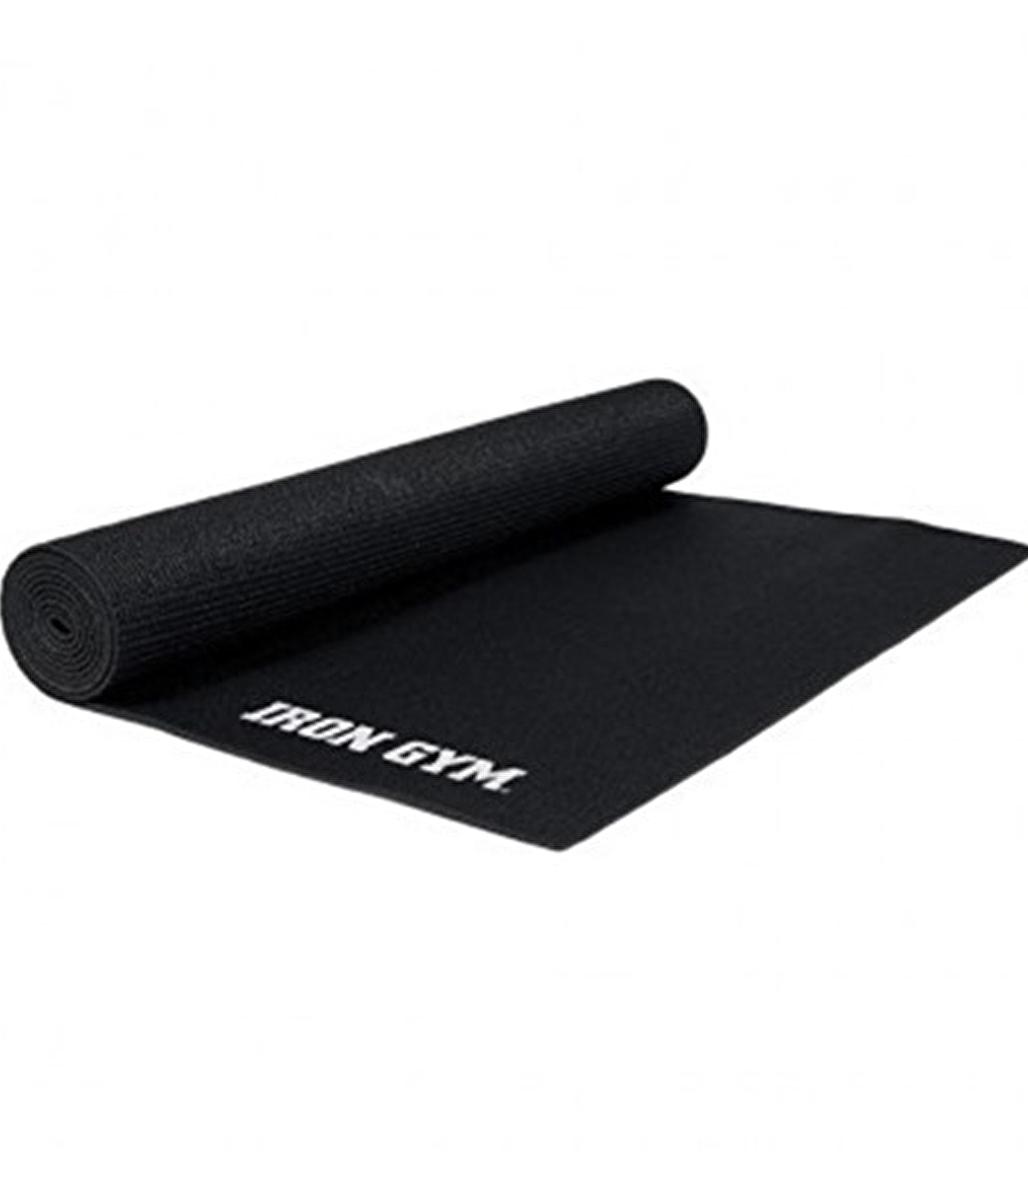 Iron Gym Exercise / Yoga Mat 3 MM